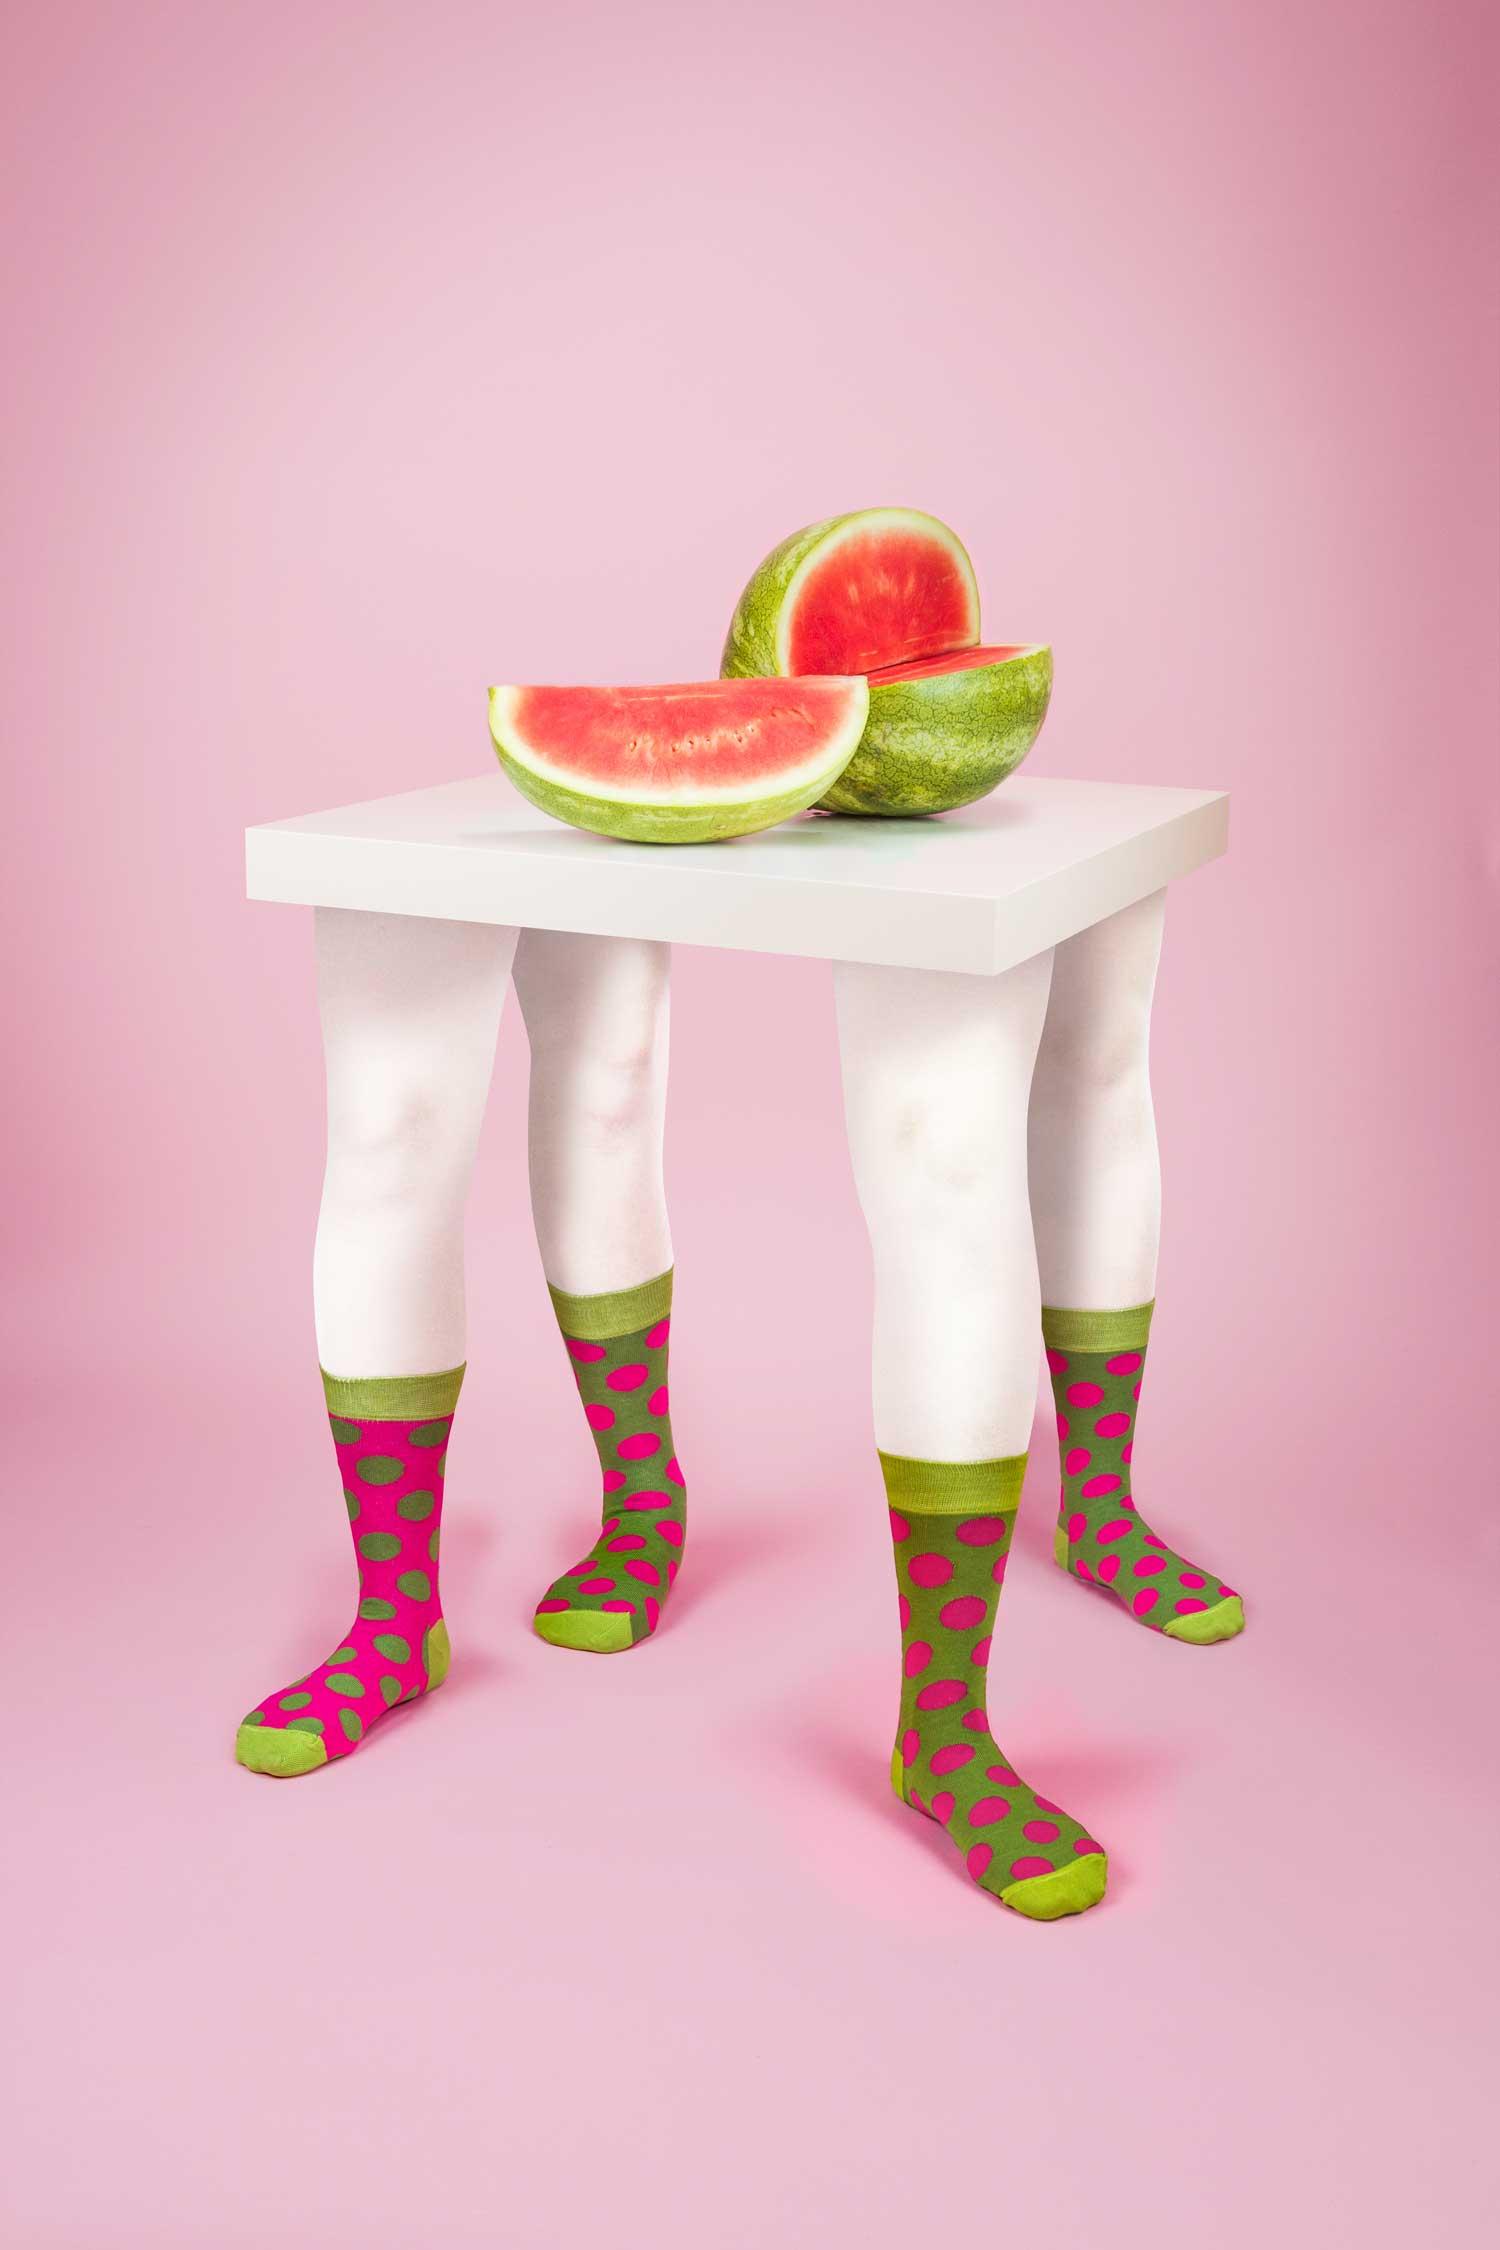 Odd Pears, Pink by Leta Sobierajski | Yellowtrace